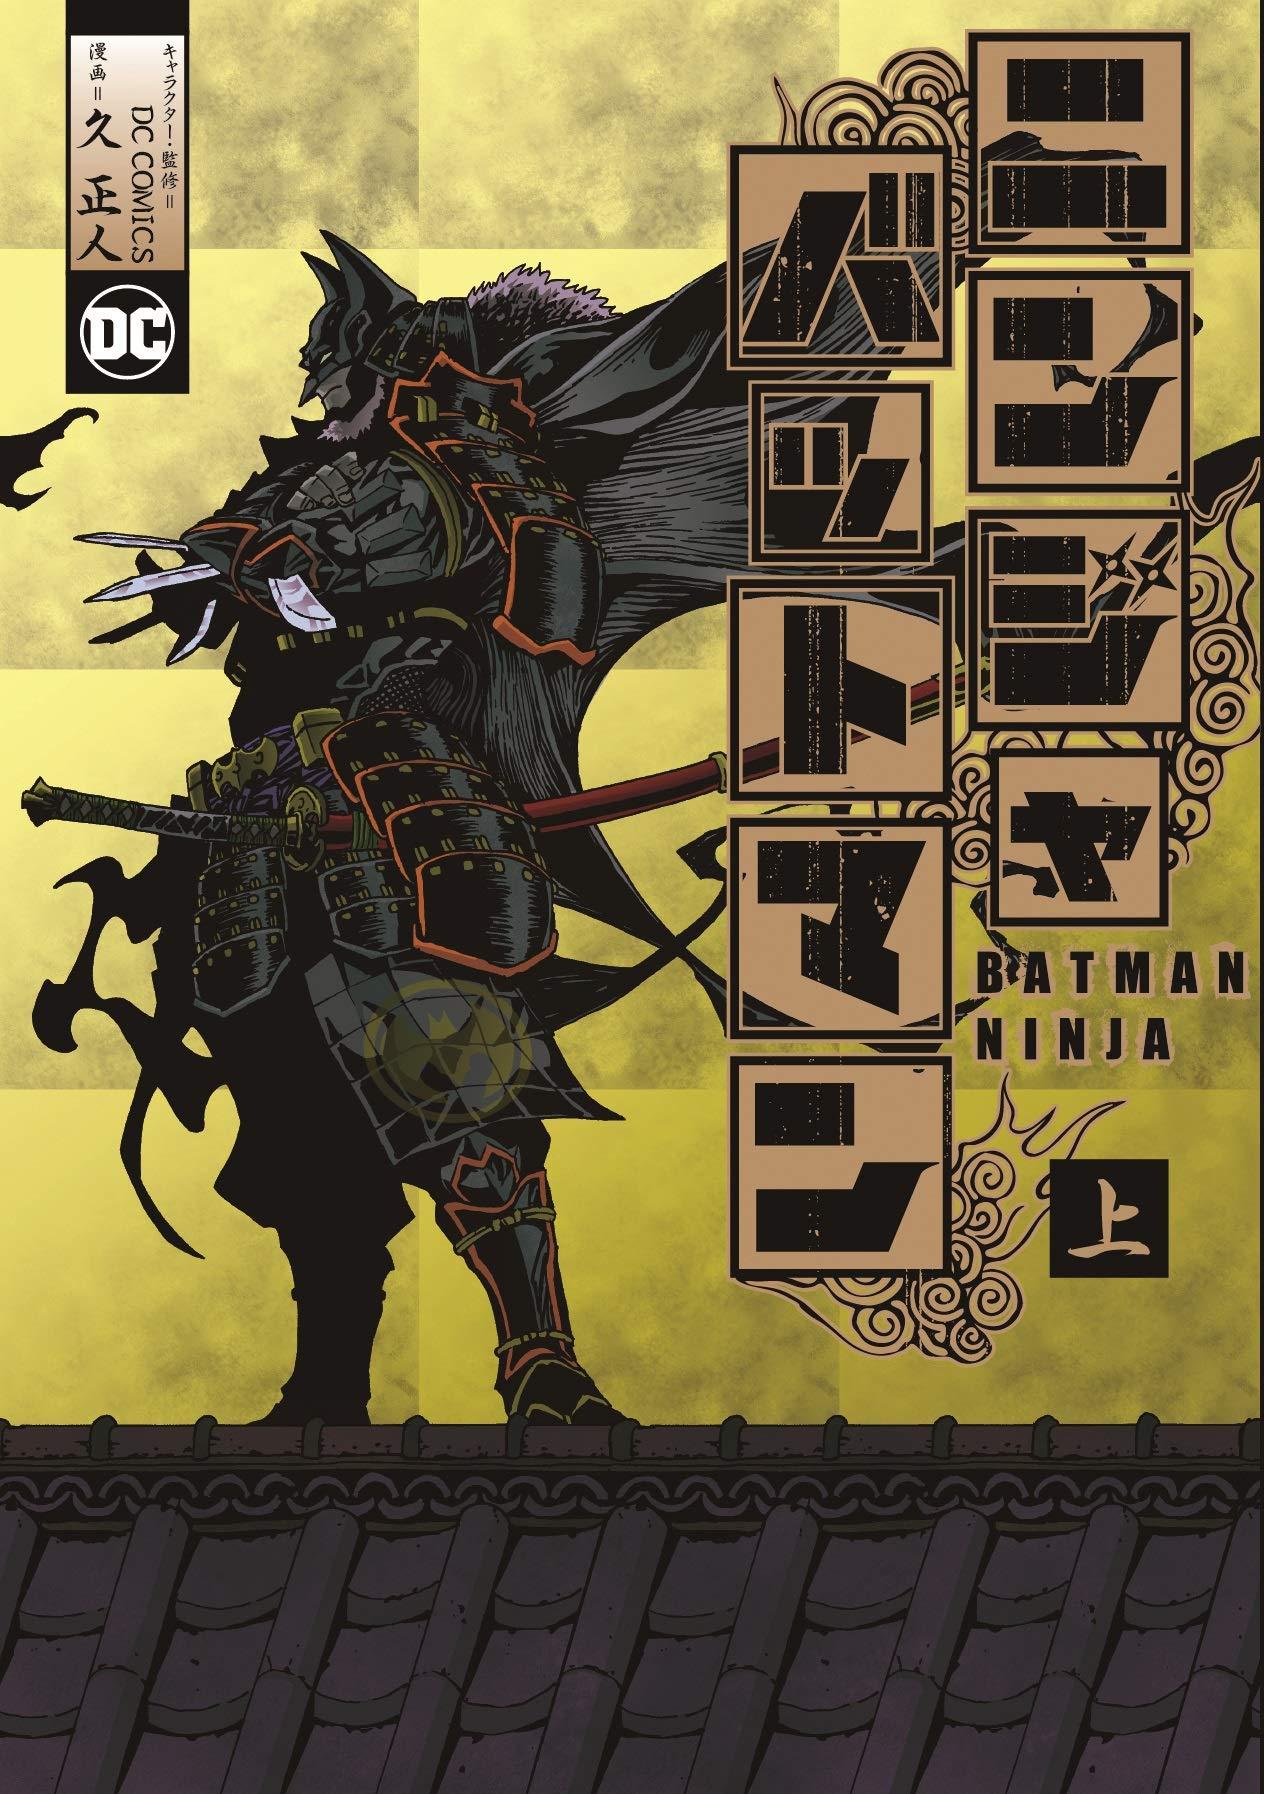 Batman Ninja first volume (Heroes Comics): Masato Hisa ...